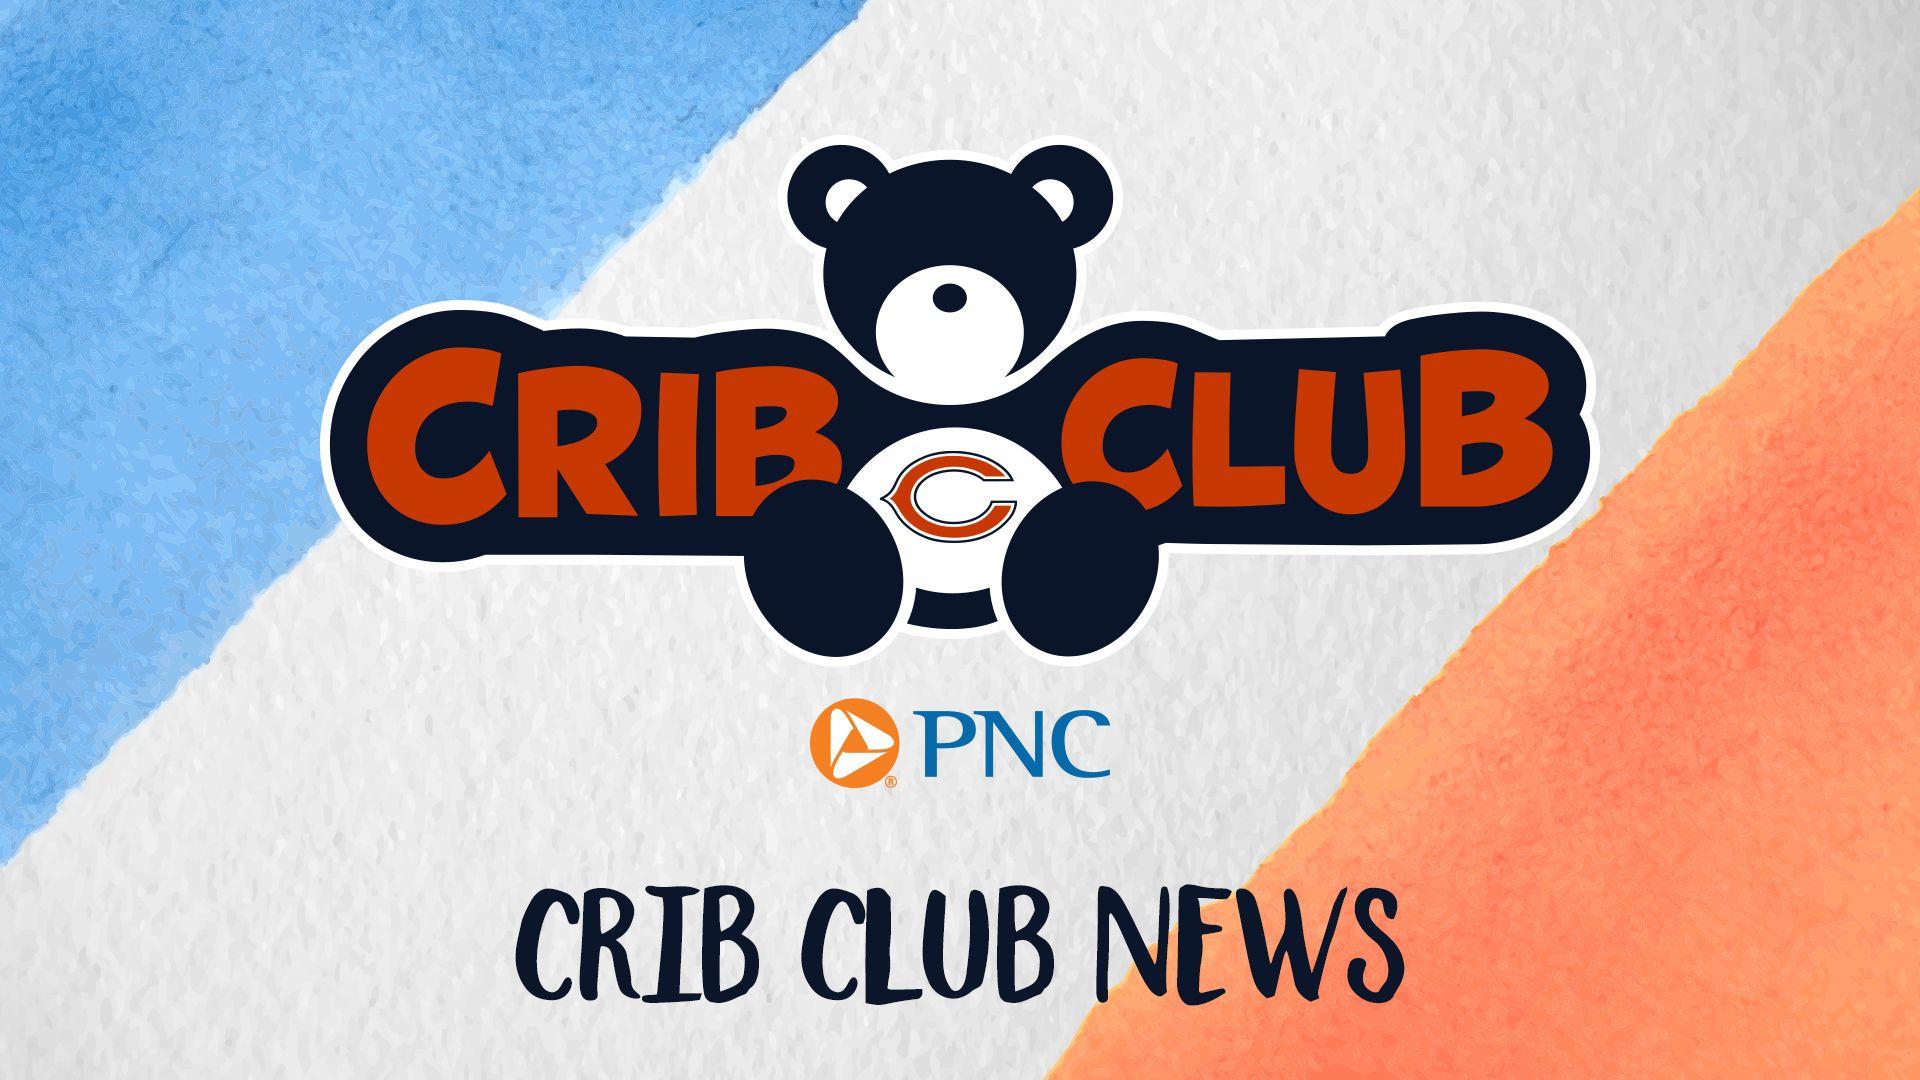 cc-news-promo-051419